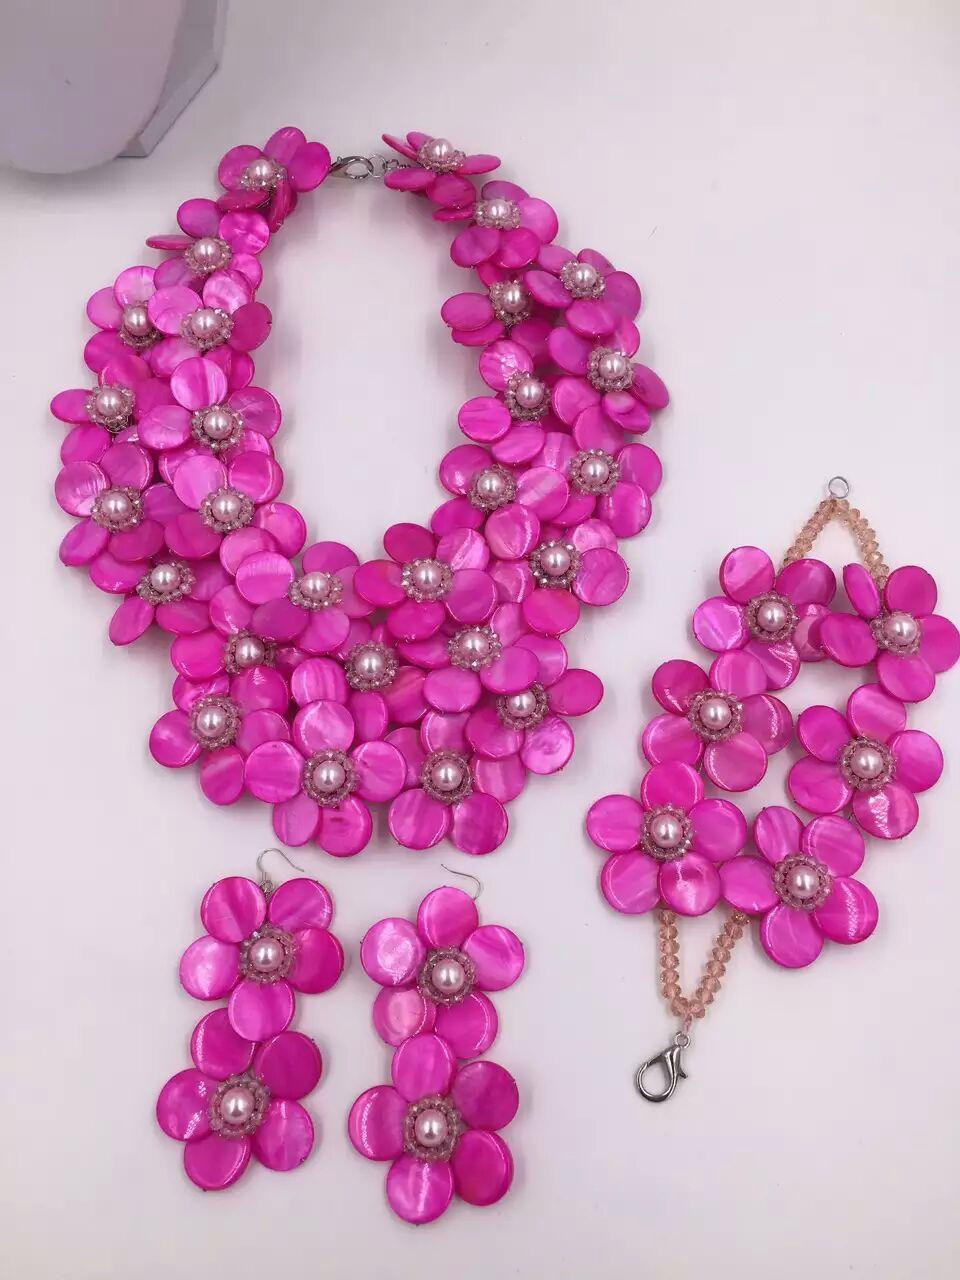 Lila rot shell und blume perlen halskette 19-20 zoll weholesale perlen geschenk FPPJ